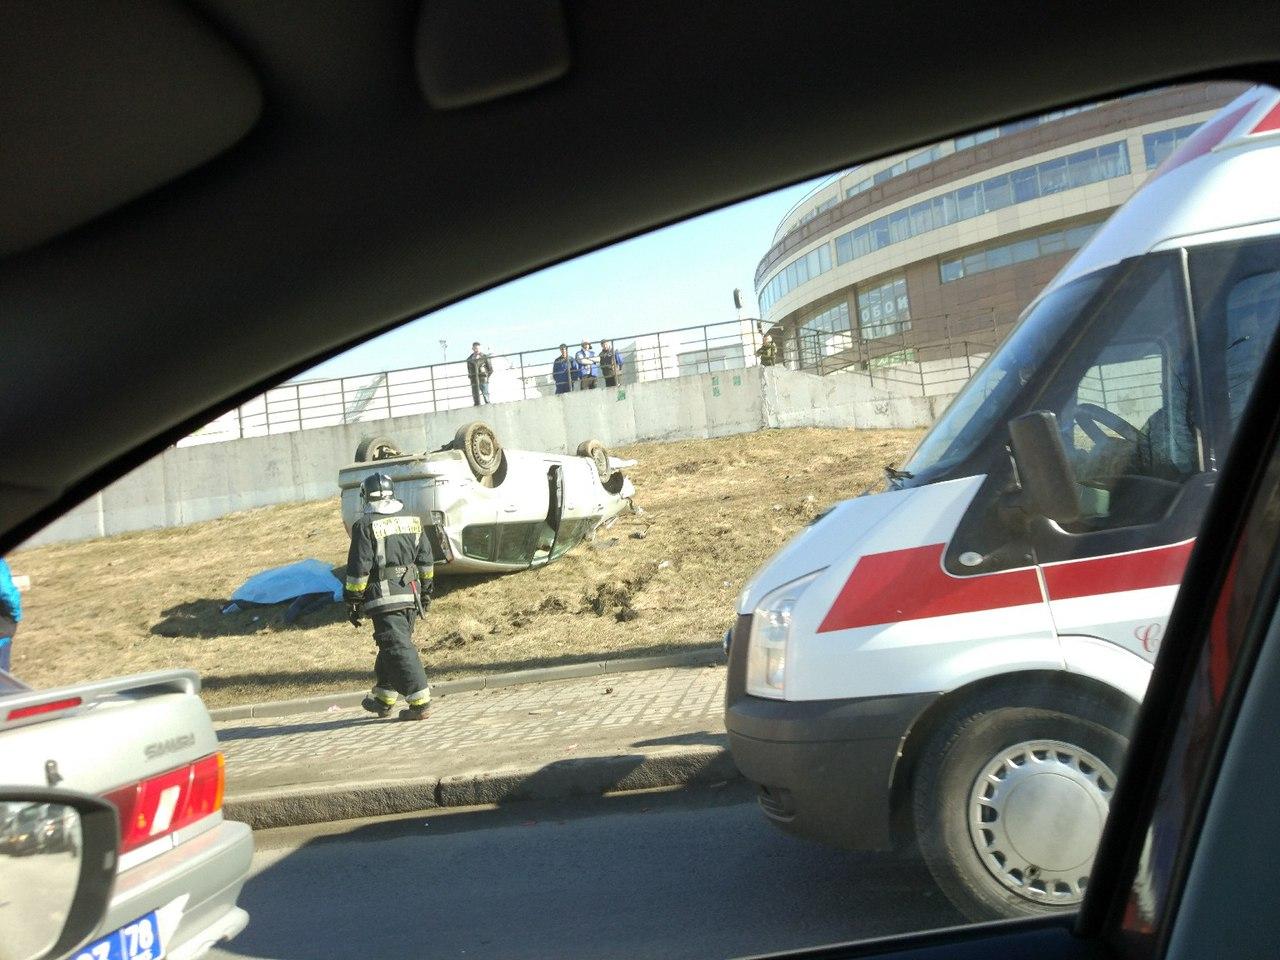 ДТП вПетербурге забрало жизни 2-х пешеходов